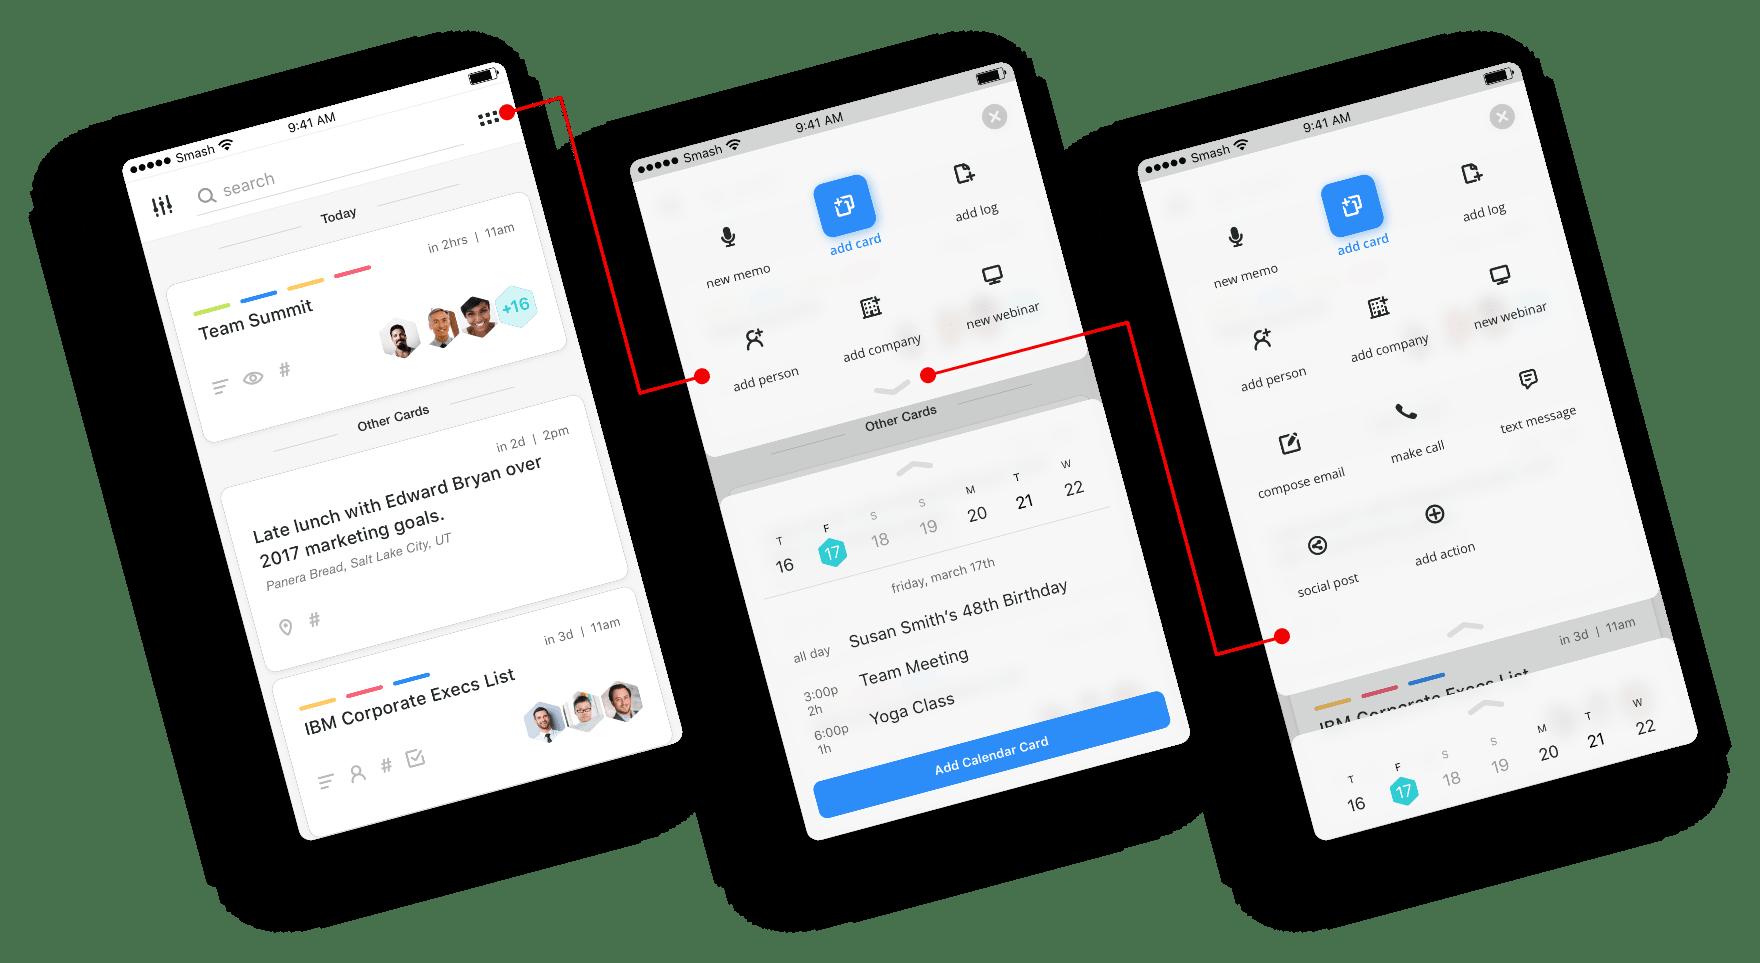 Smash mobile walkthrough of smash bar menu